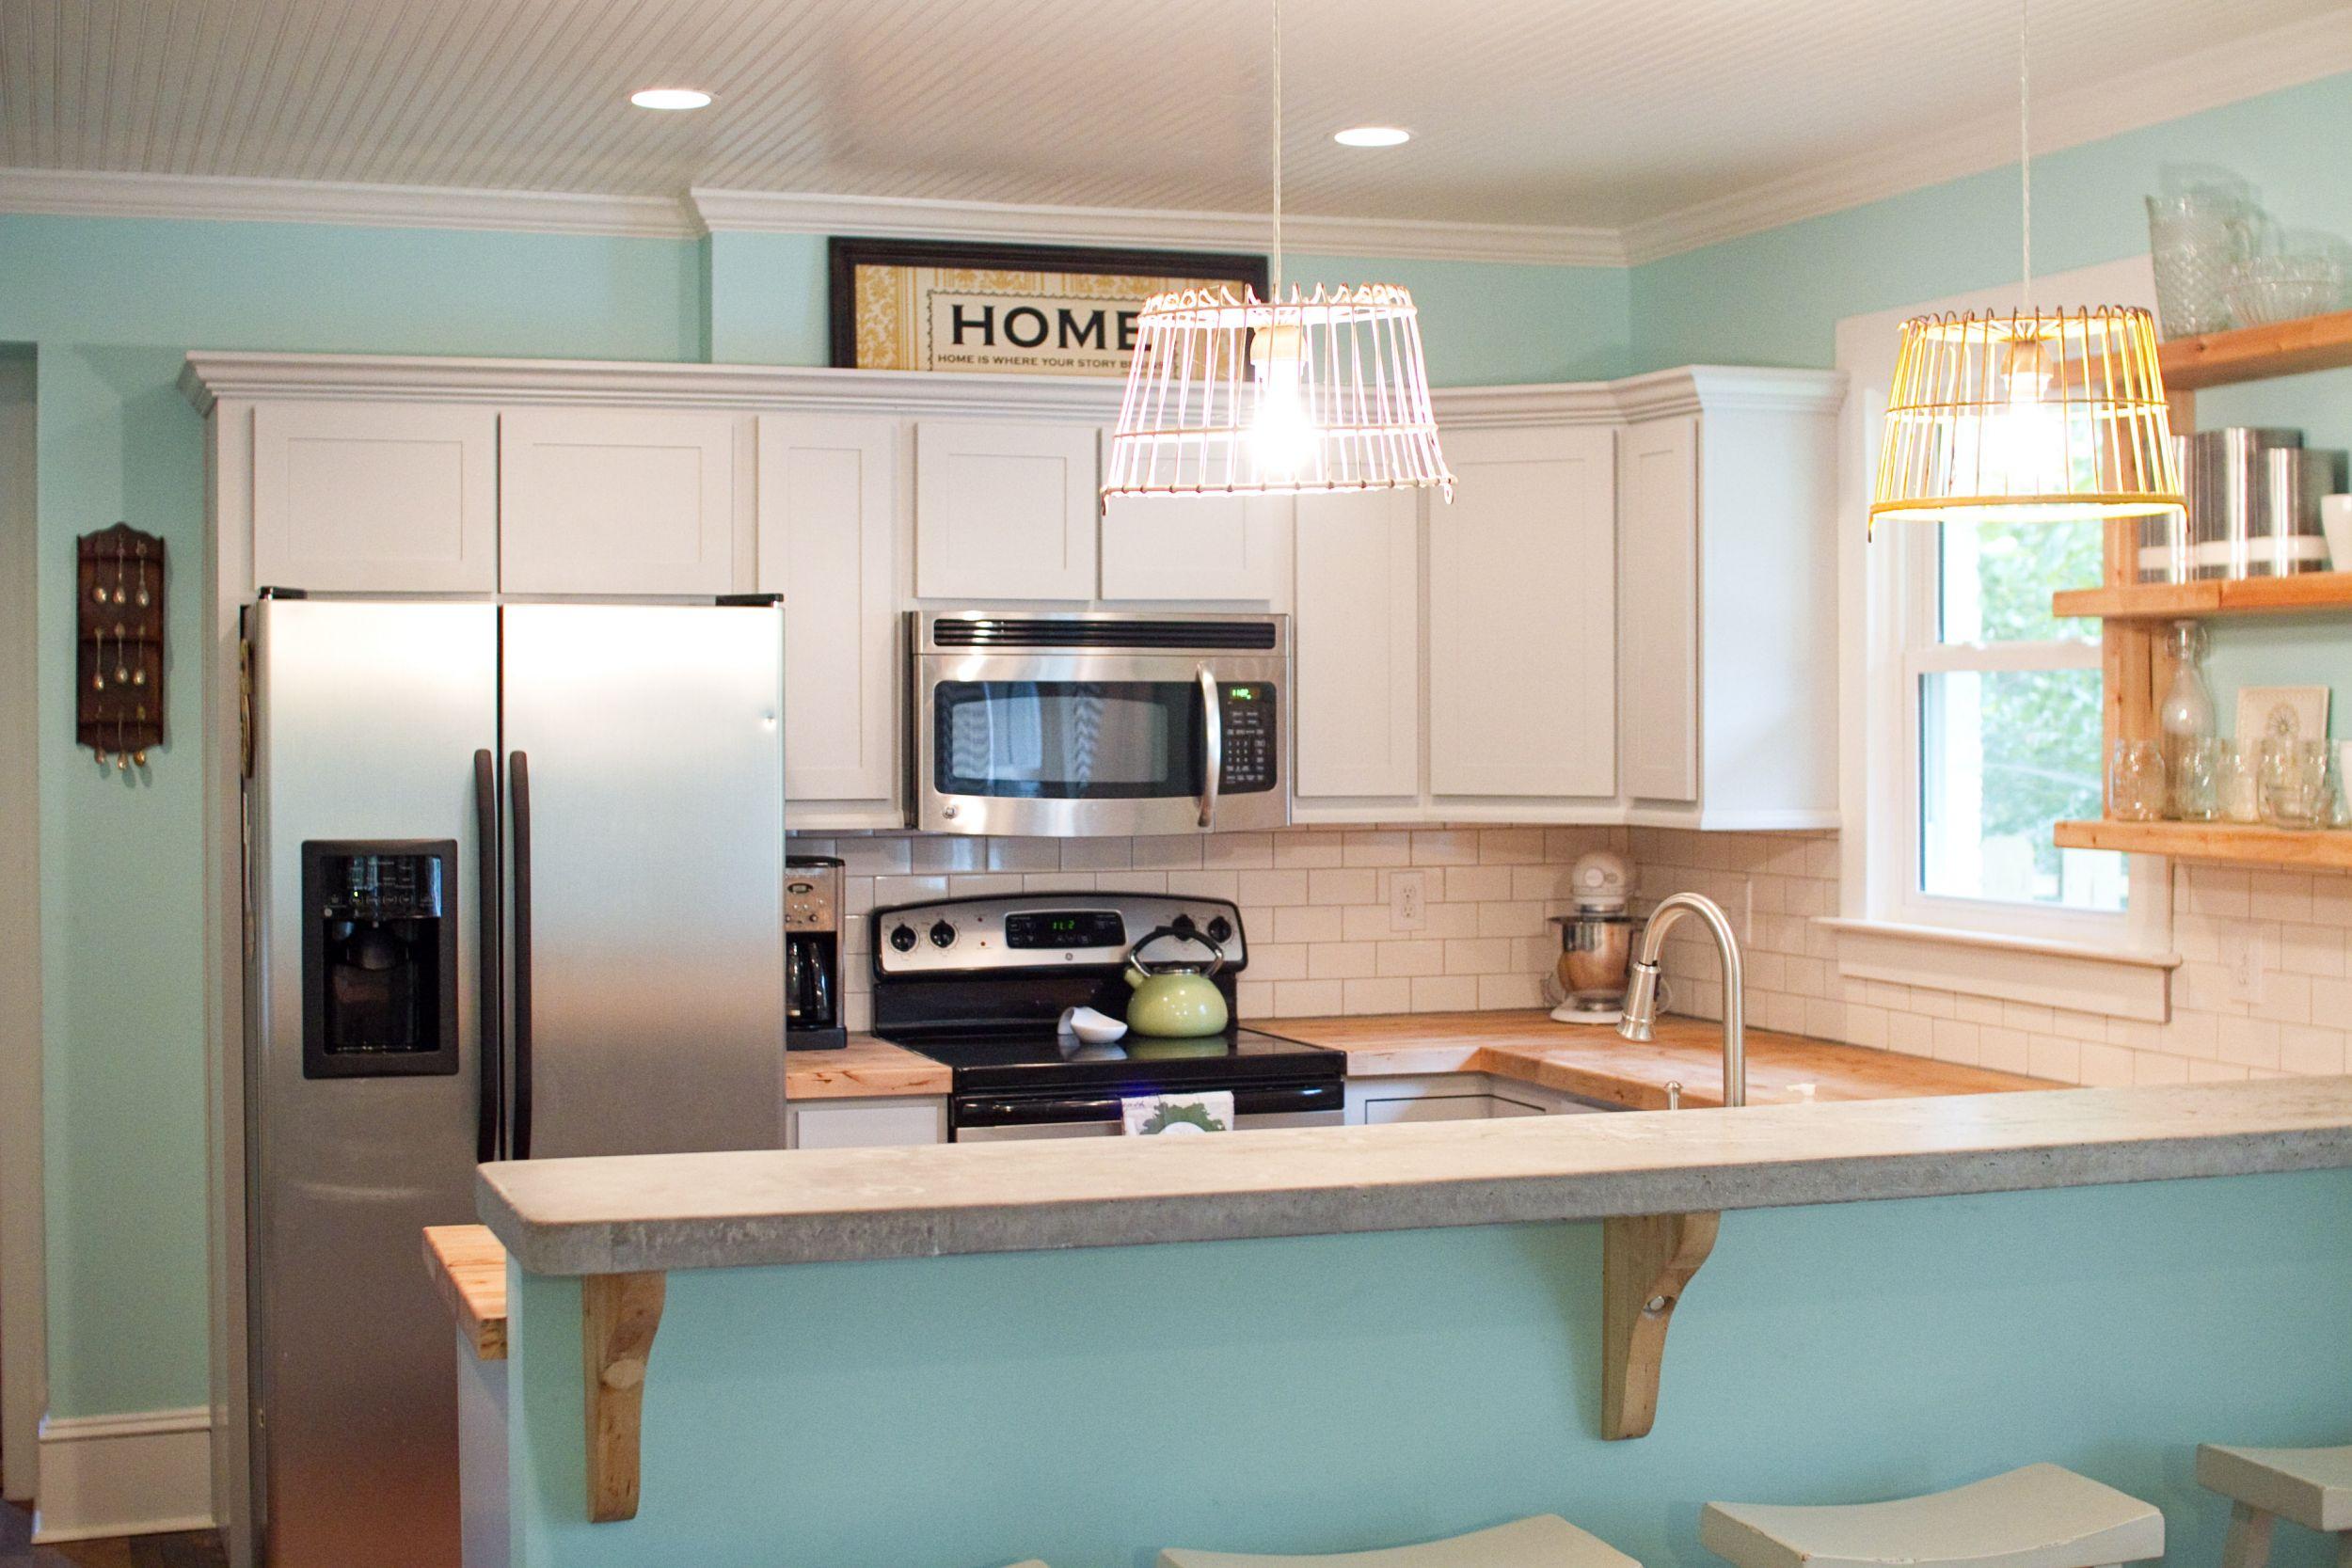 kitchen renovation ideas small kitchen remodel ideas diy kitchen cabinet ideas budget budget kitchen renovation progress